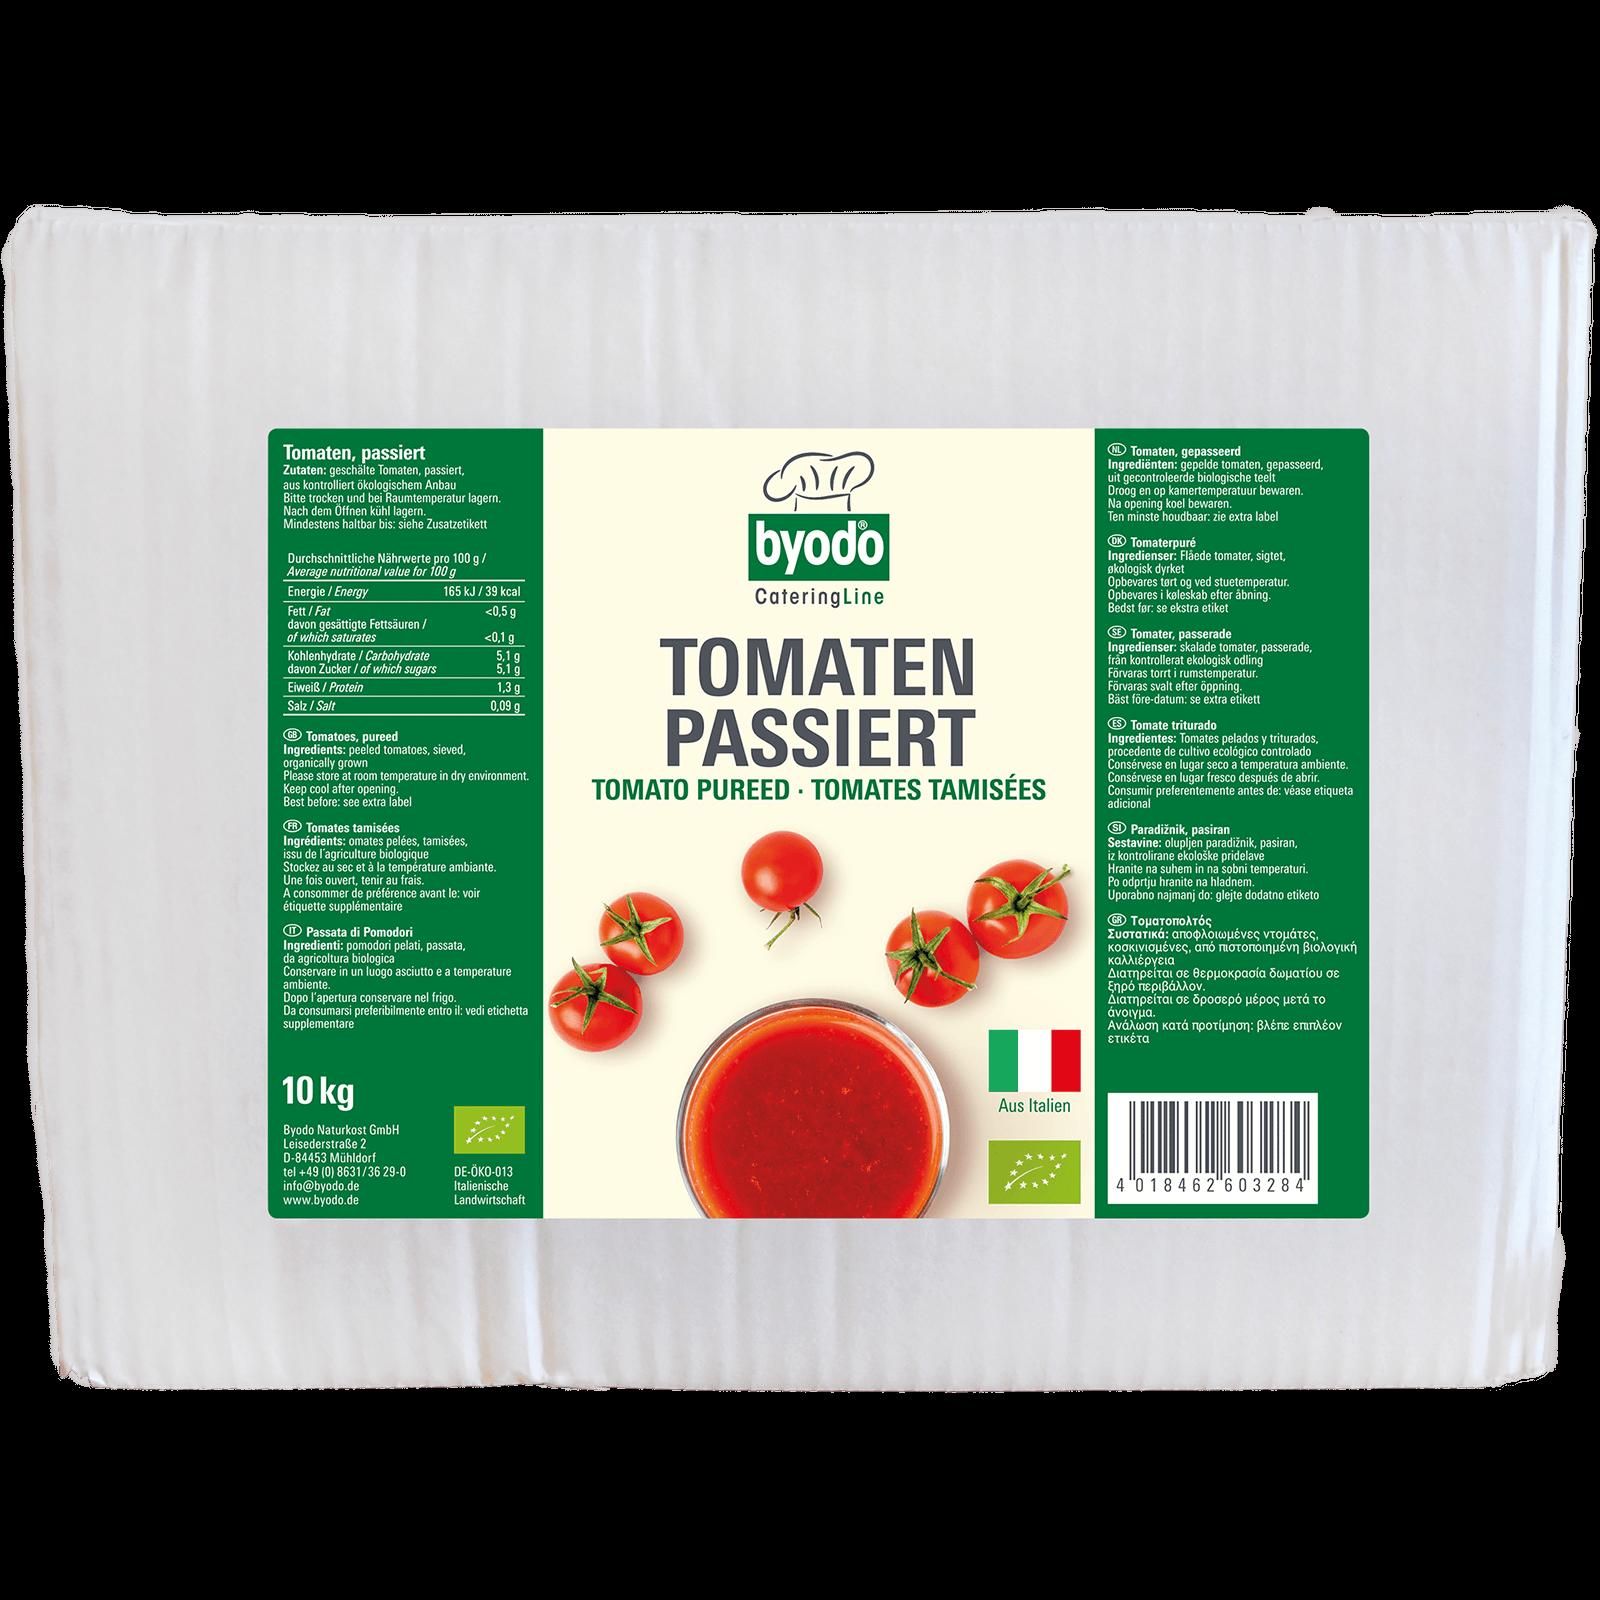 Bio-Tomaten passiert 10kg